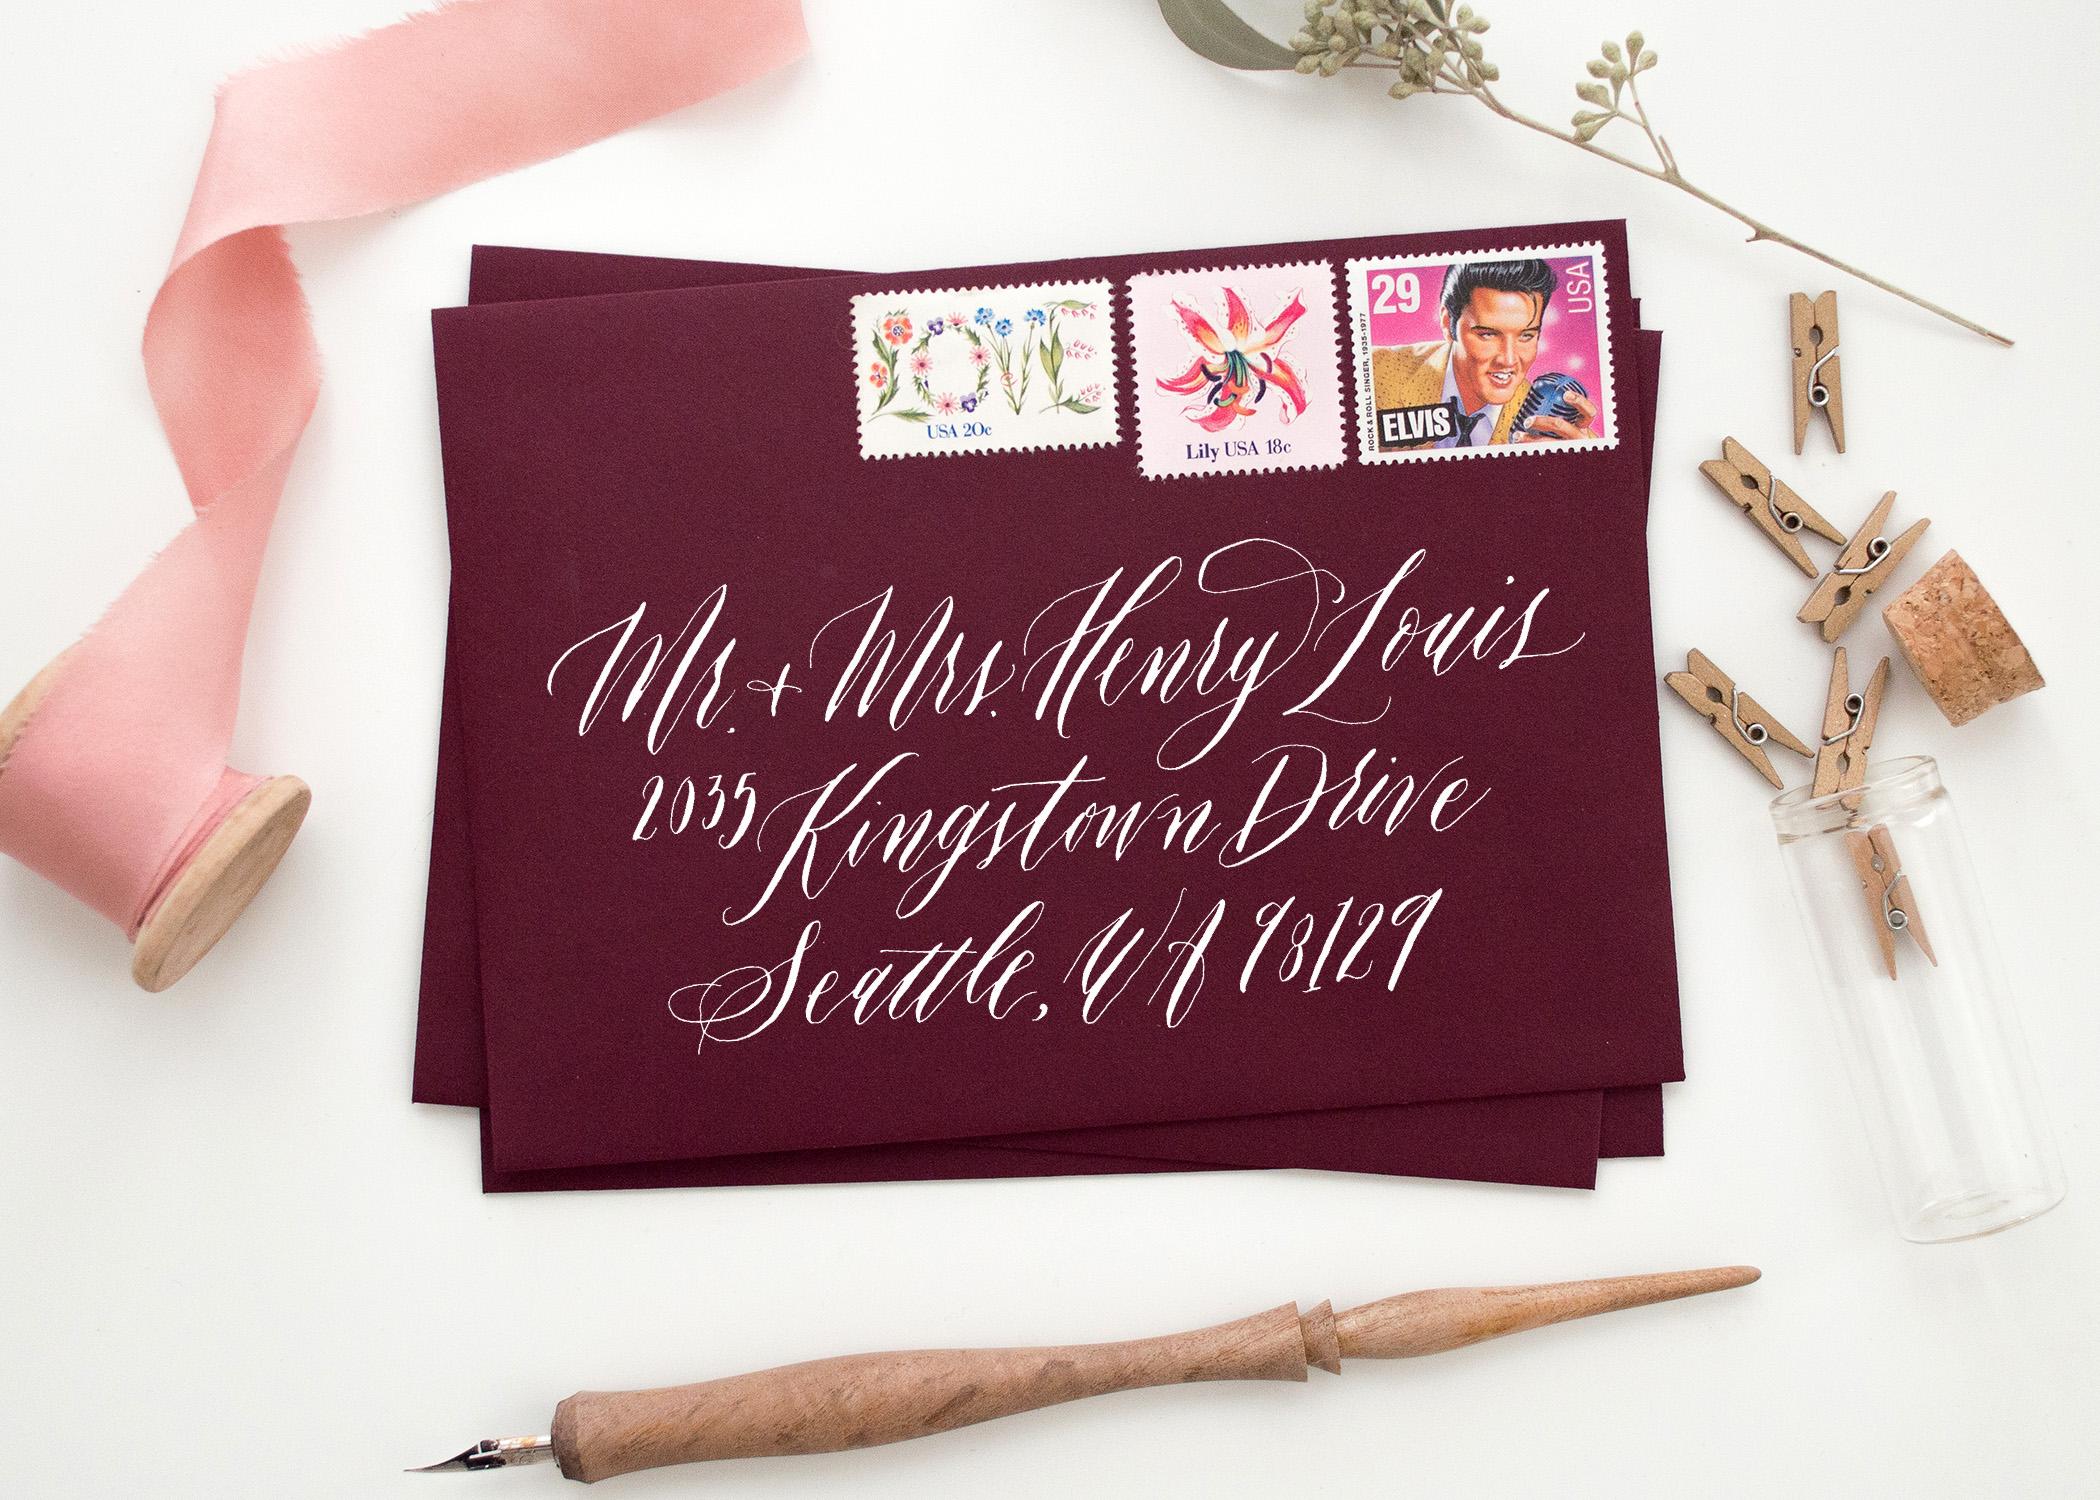 marietta calligraphy, wedding calligrapher, marietta calligrapher, georgia calligrapher, atlanta calligrapher